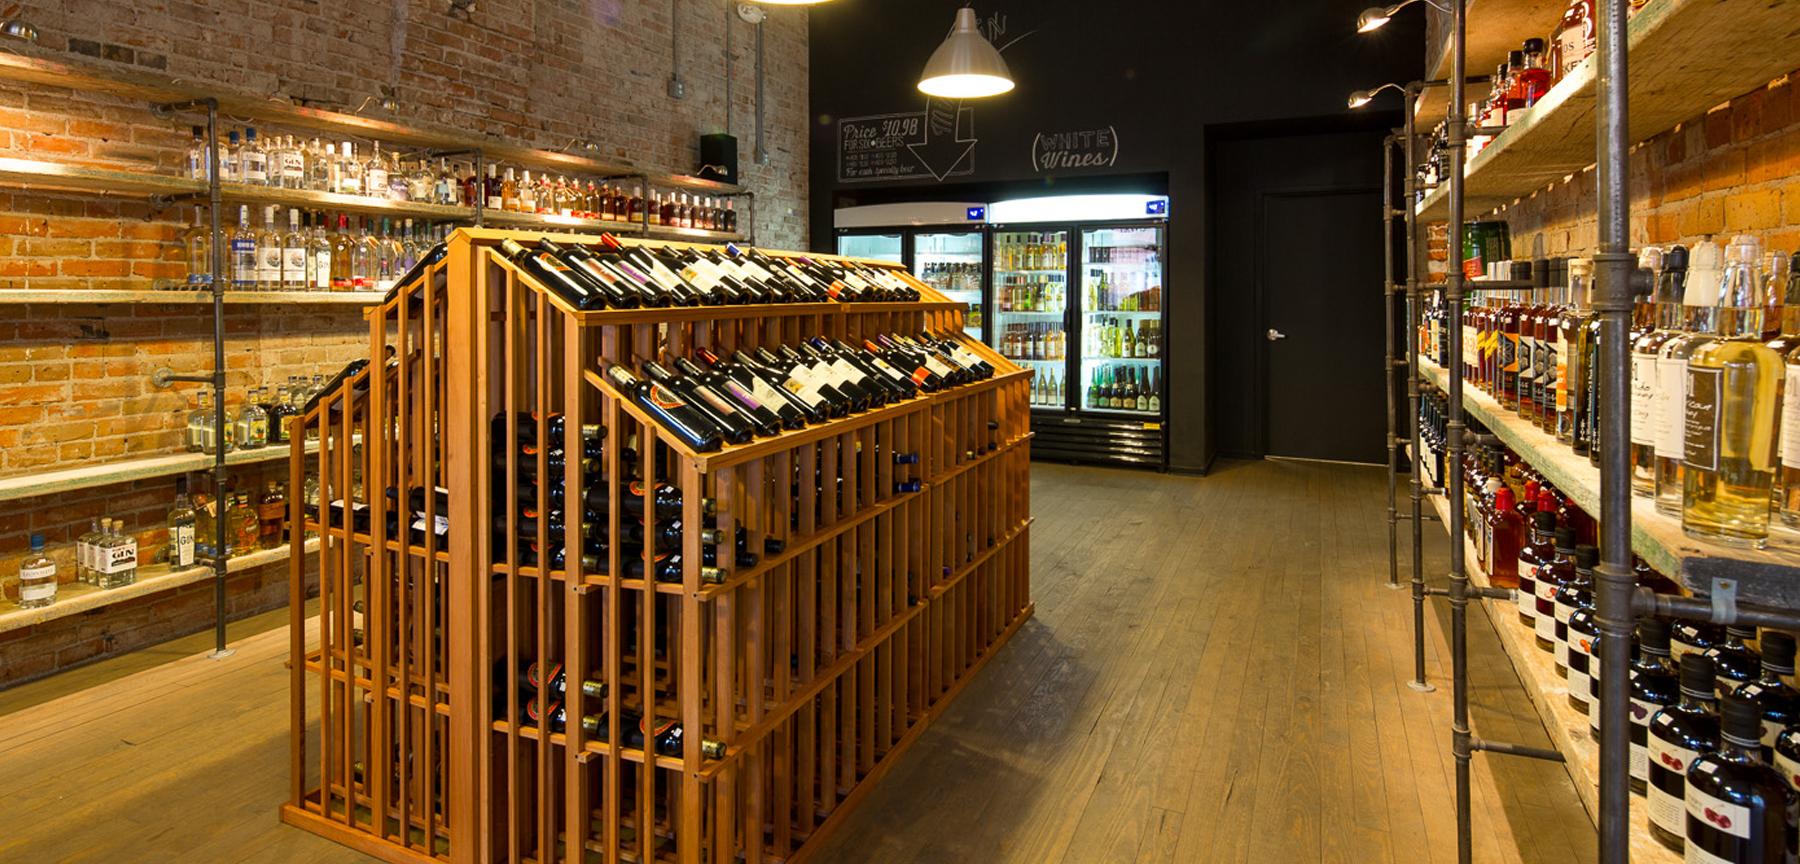 Hugo's Colorado Beer and Spirits wine area